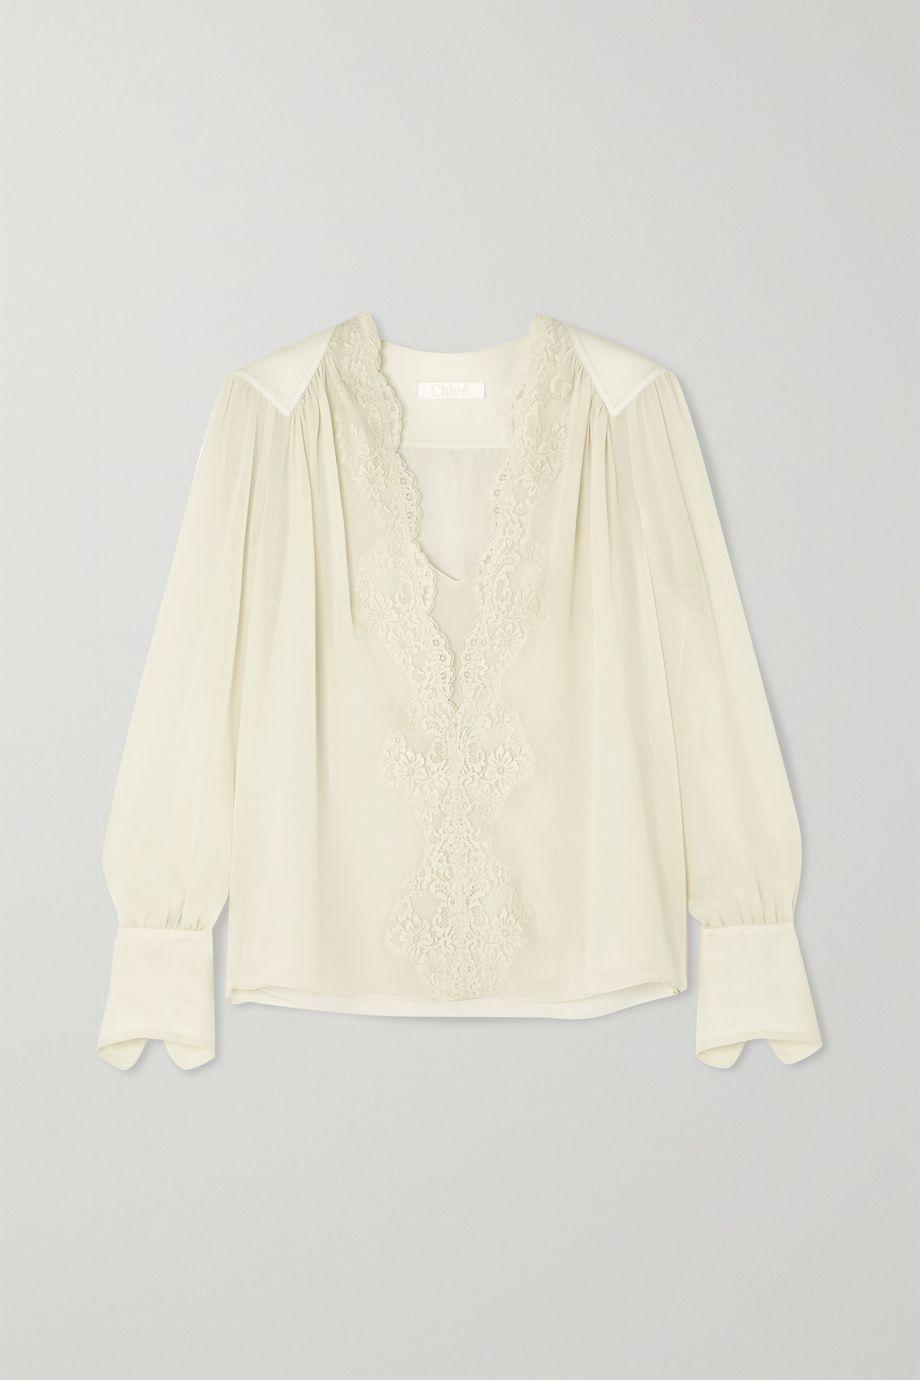 Chloé Lace-trimmed silk-chiffon blouse